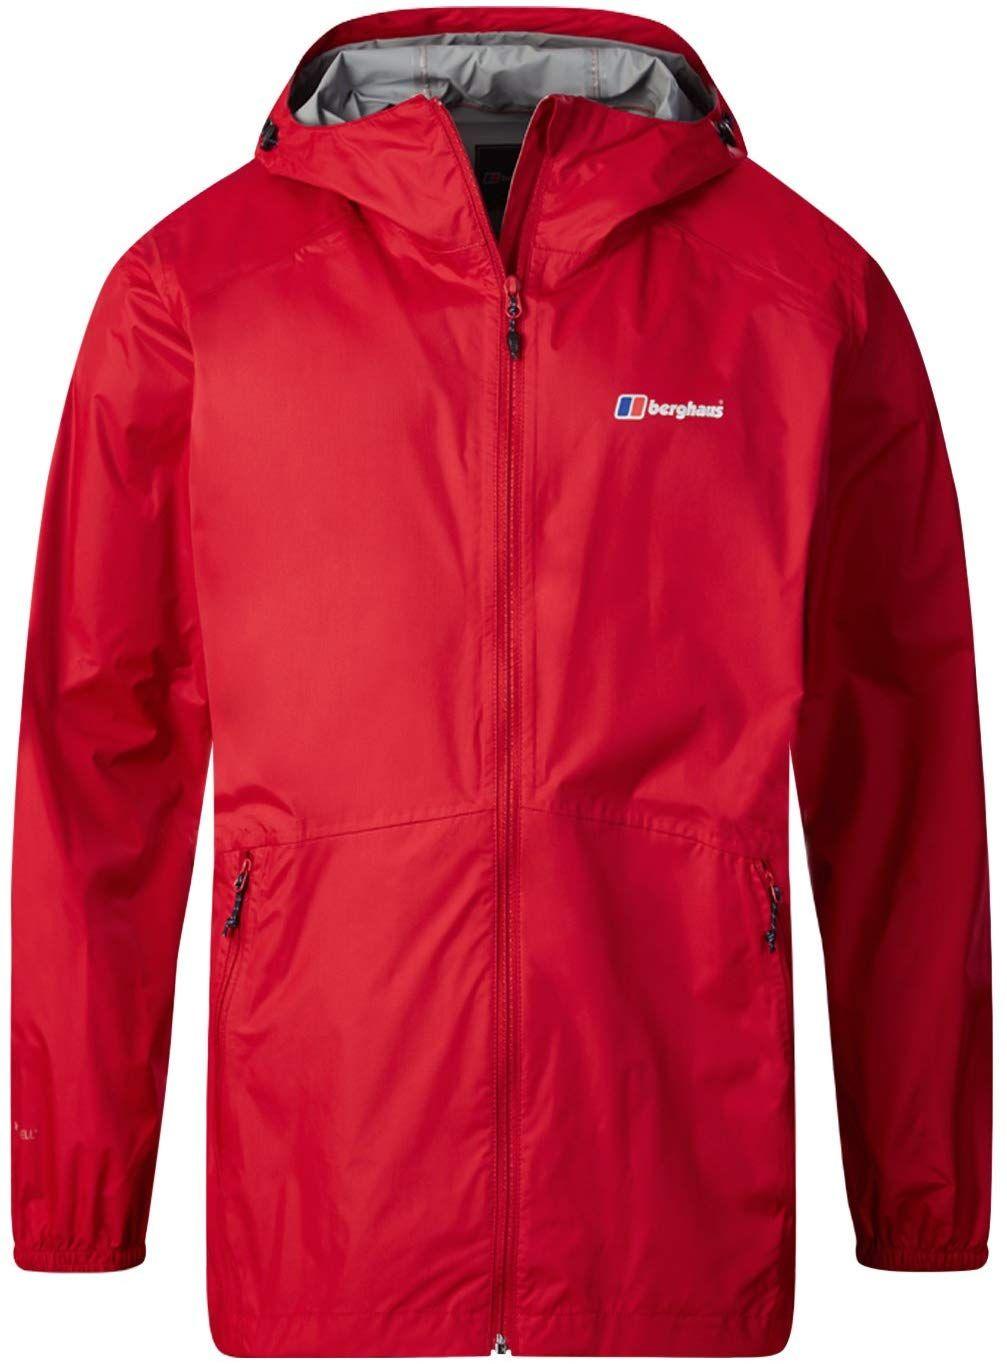 Berghaus Men's Deluge Light Waterproof Jacket  large only @ Amazon £35.46